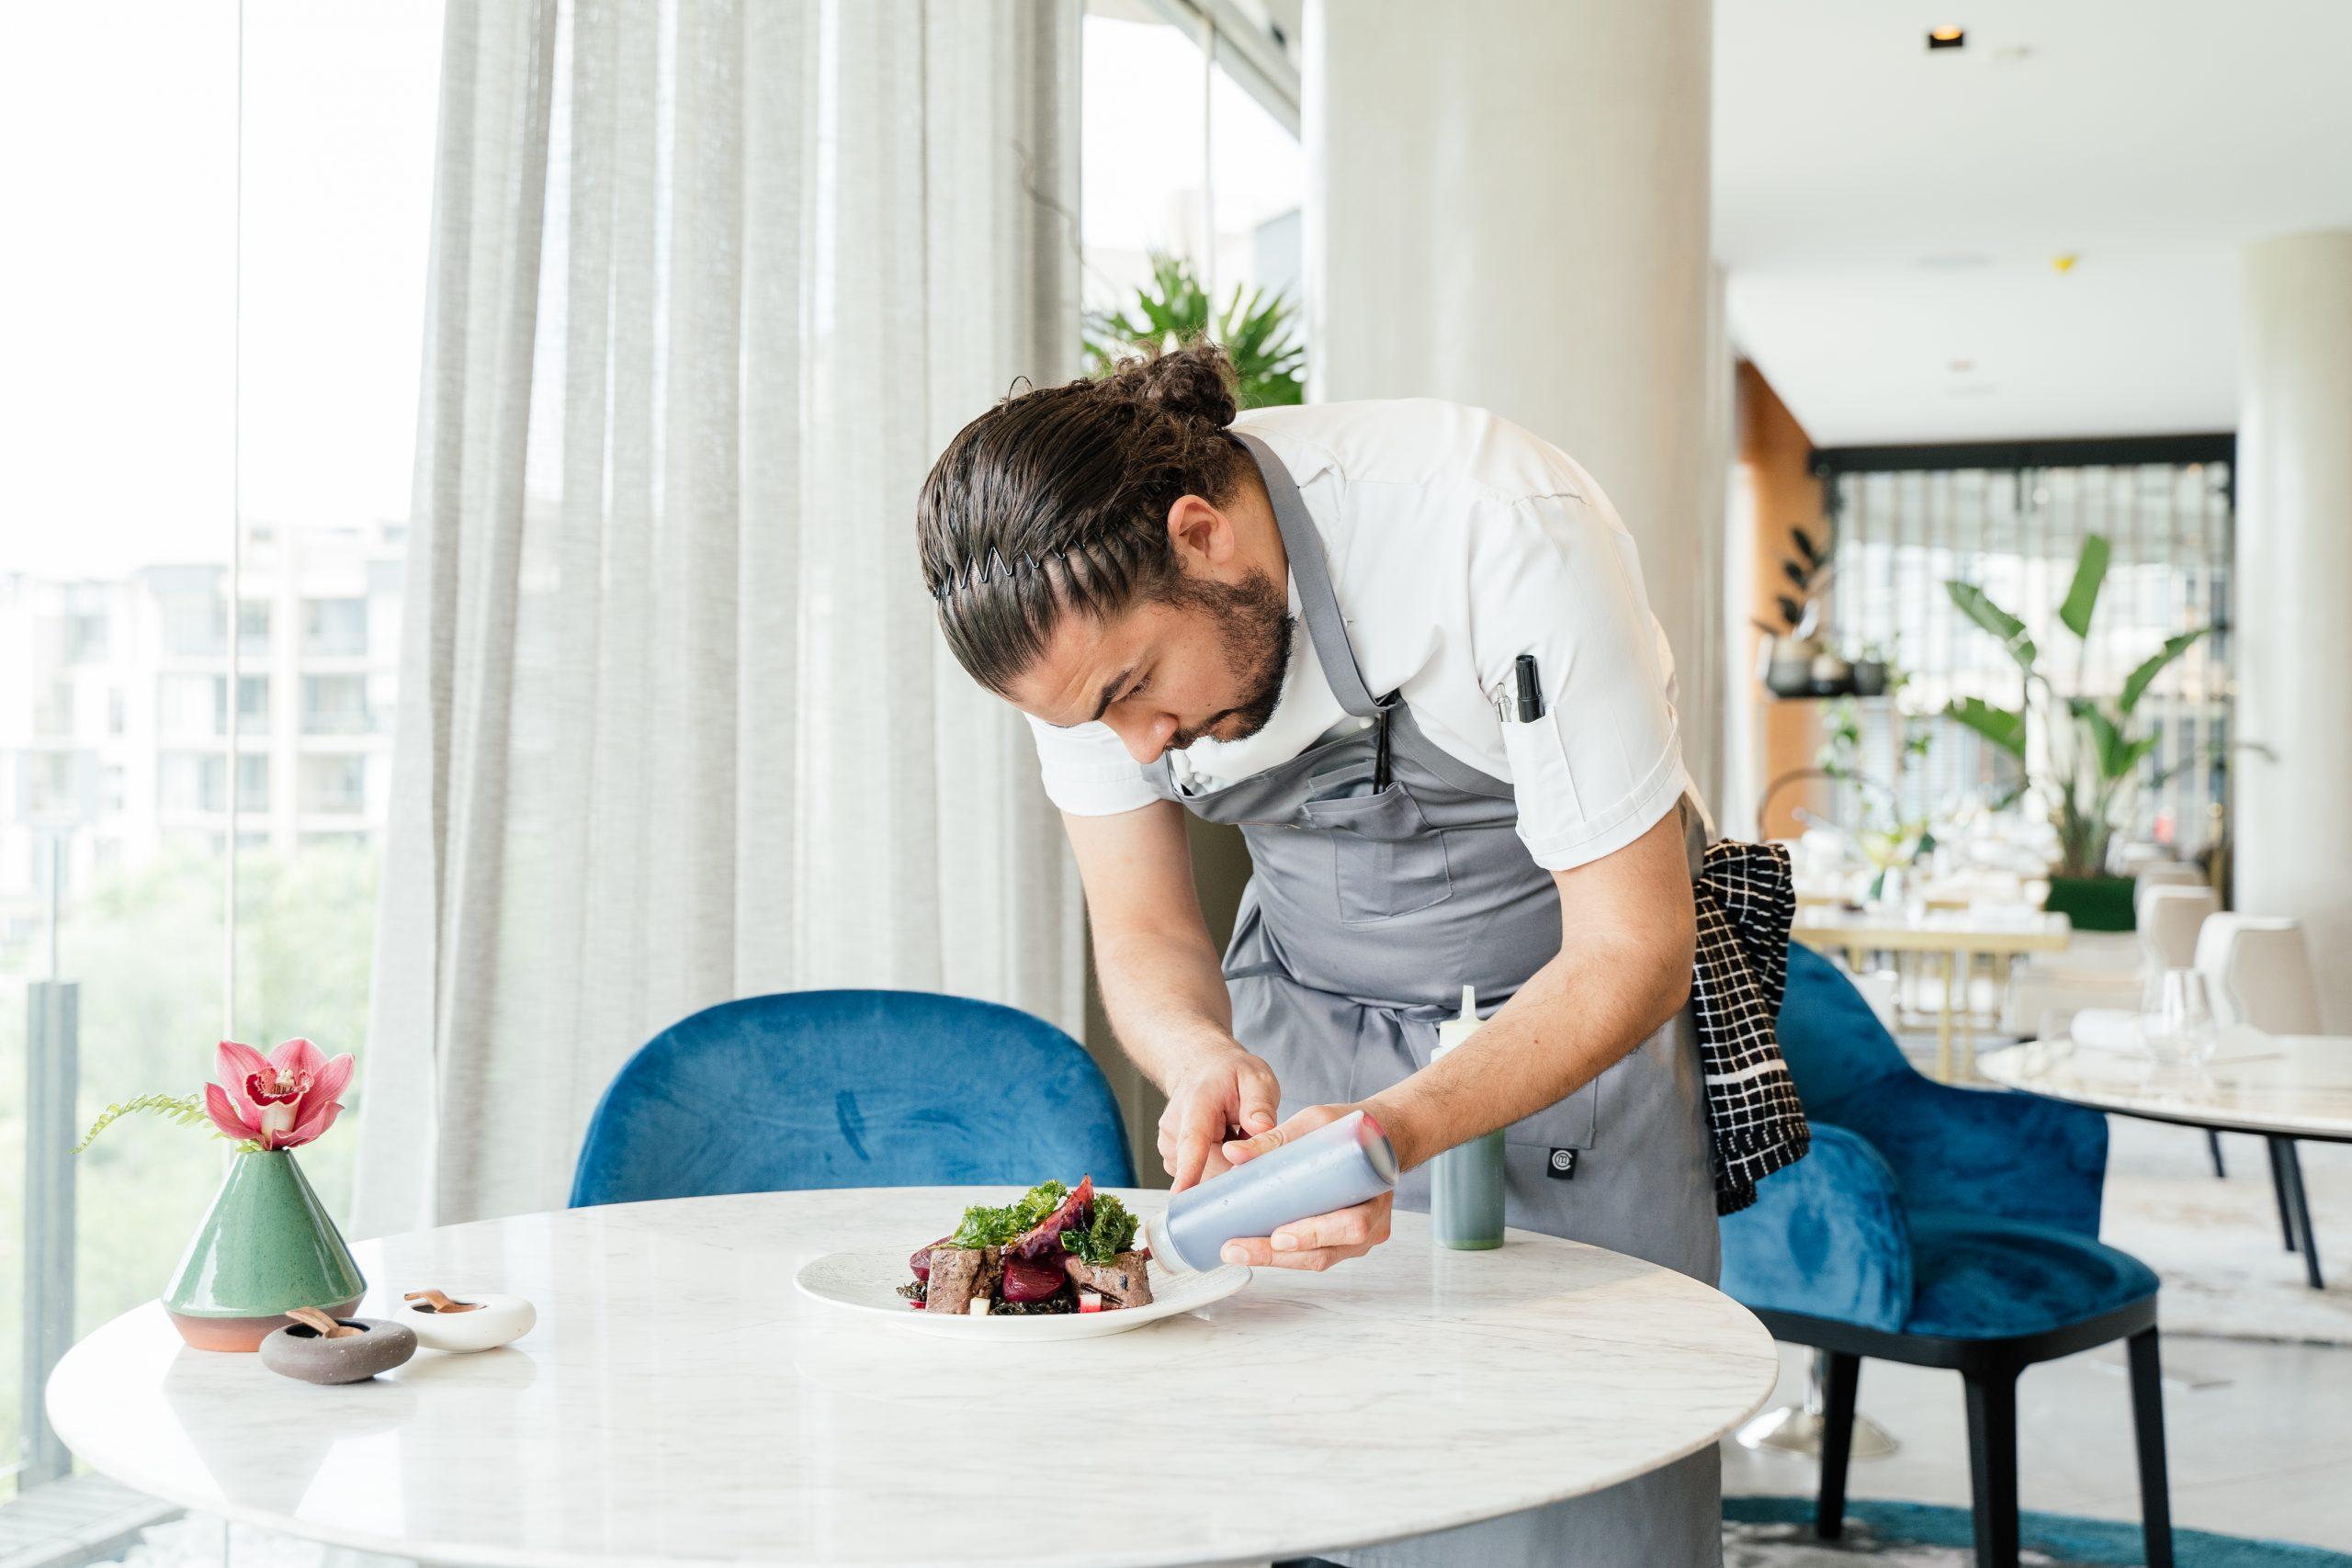 Séjour restaurant - Chef Freddie Dias